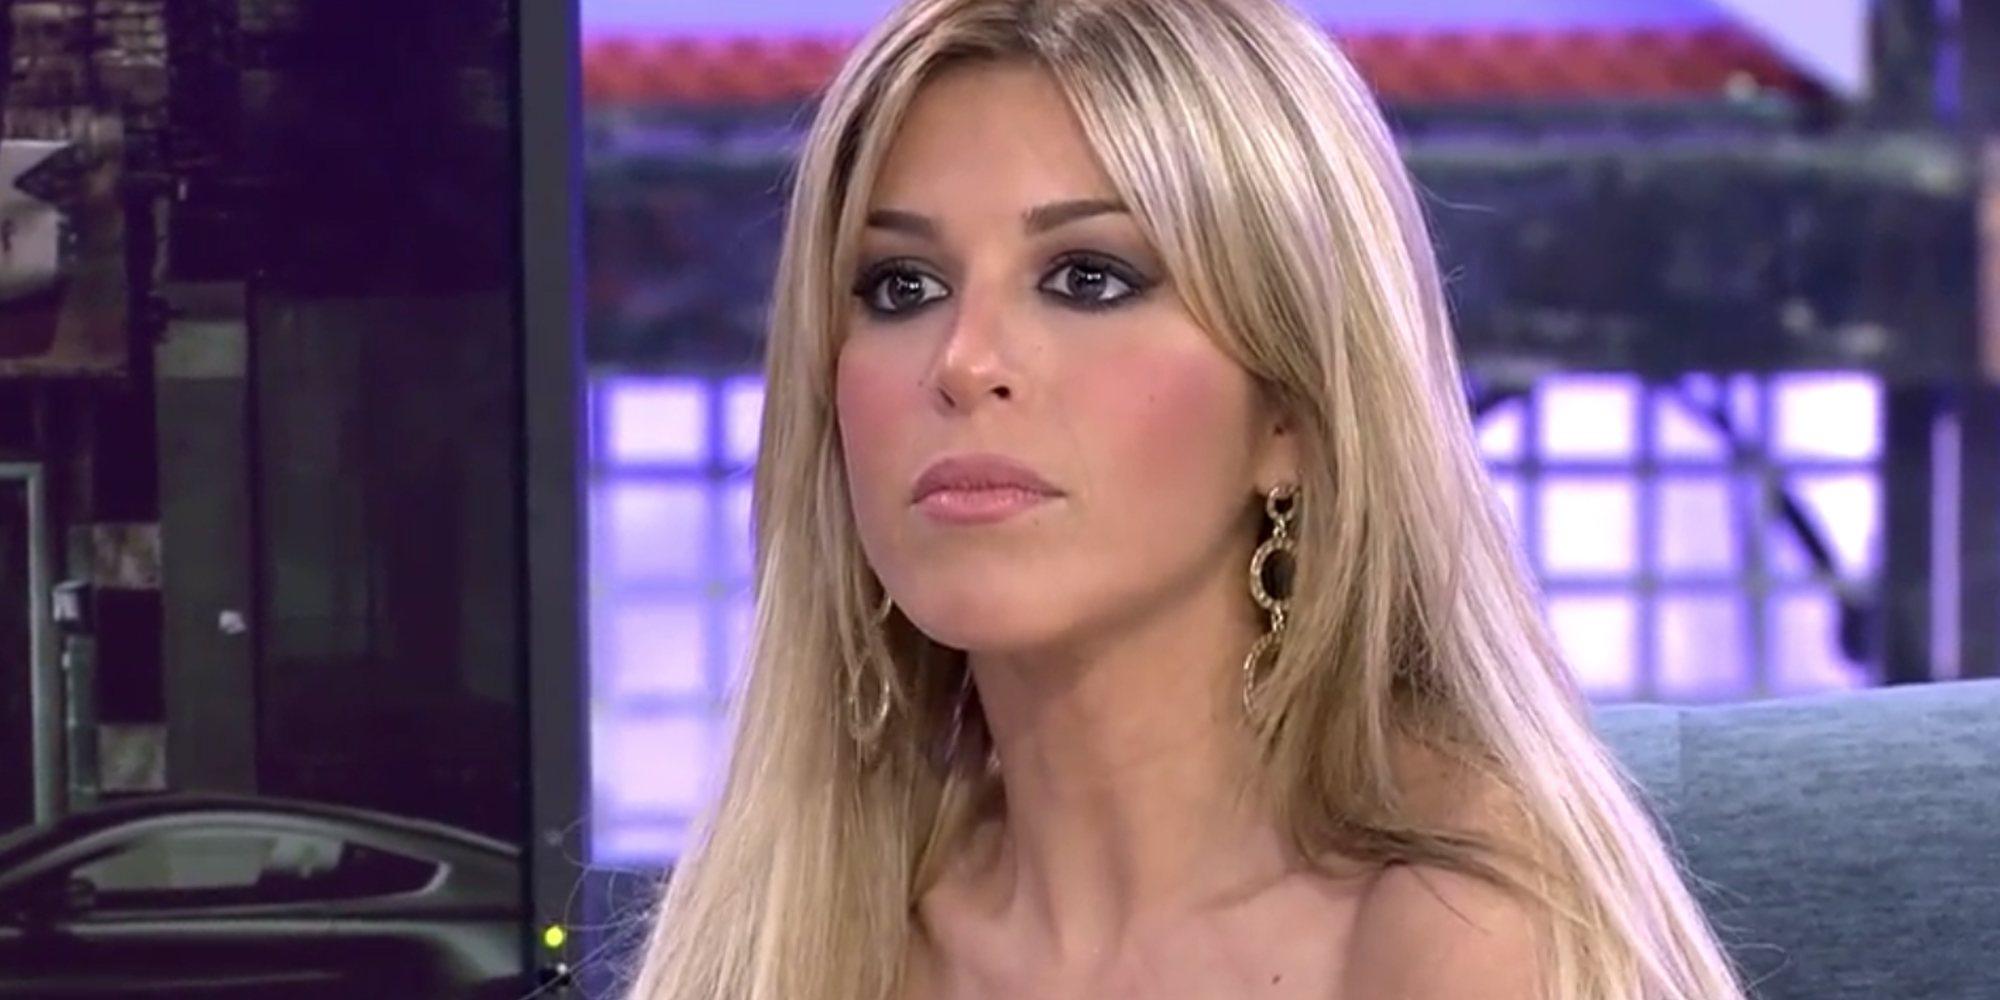 Celebrites Oriana Marzoli nudes (73 foto and video), Tits, Bikini, Twitter, cleavage 2019